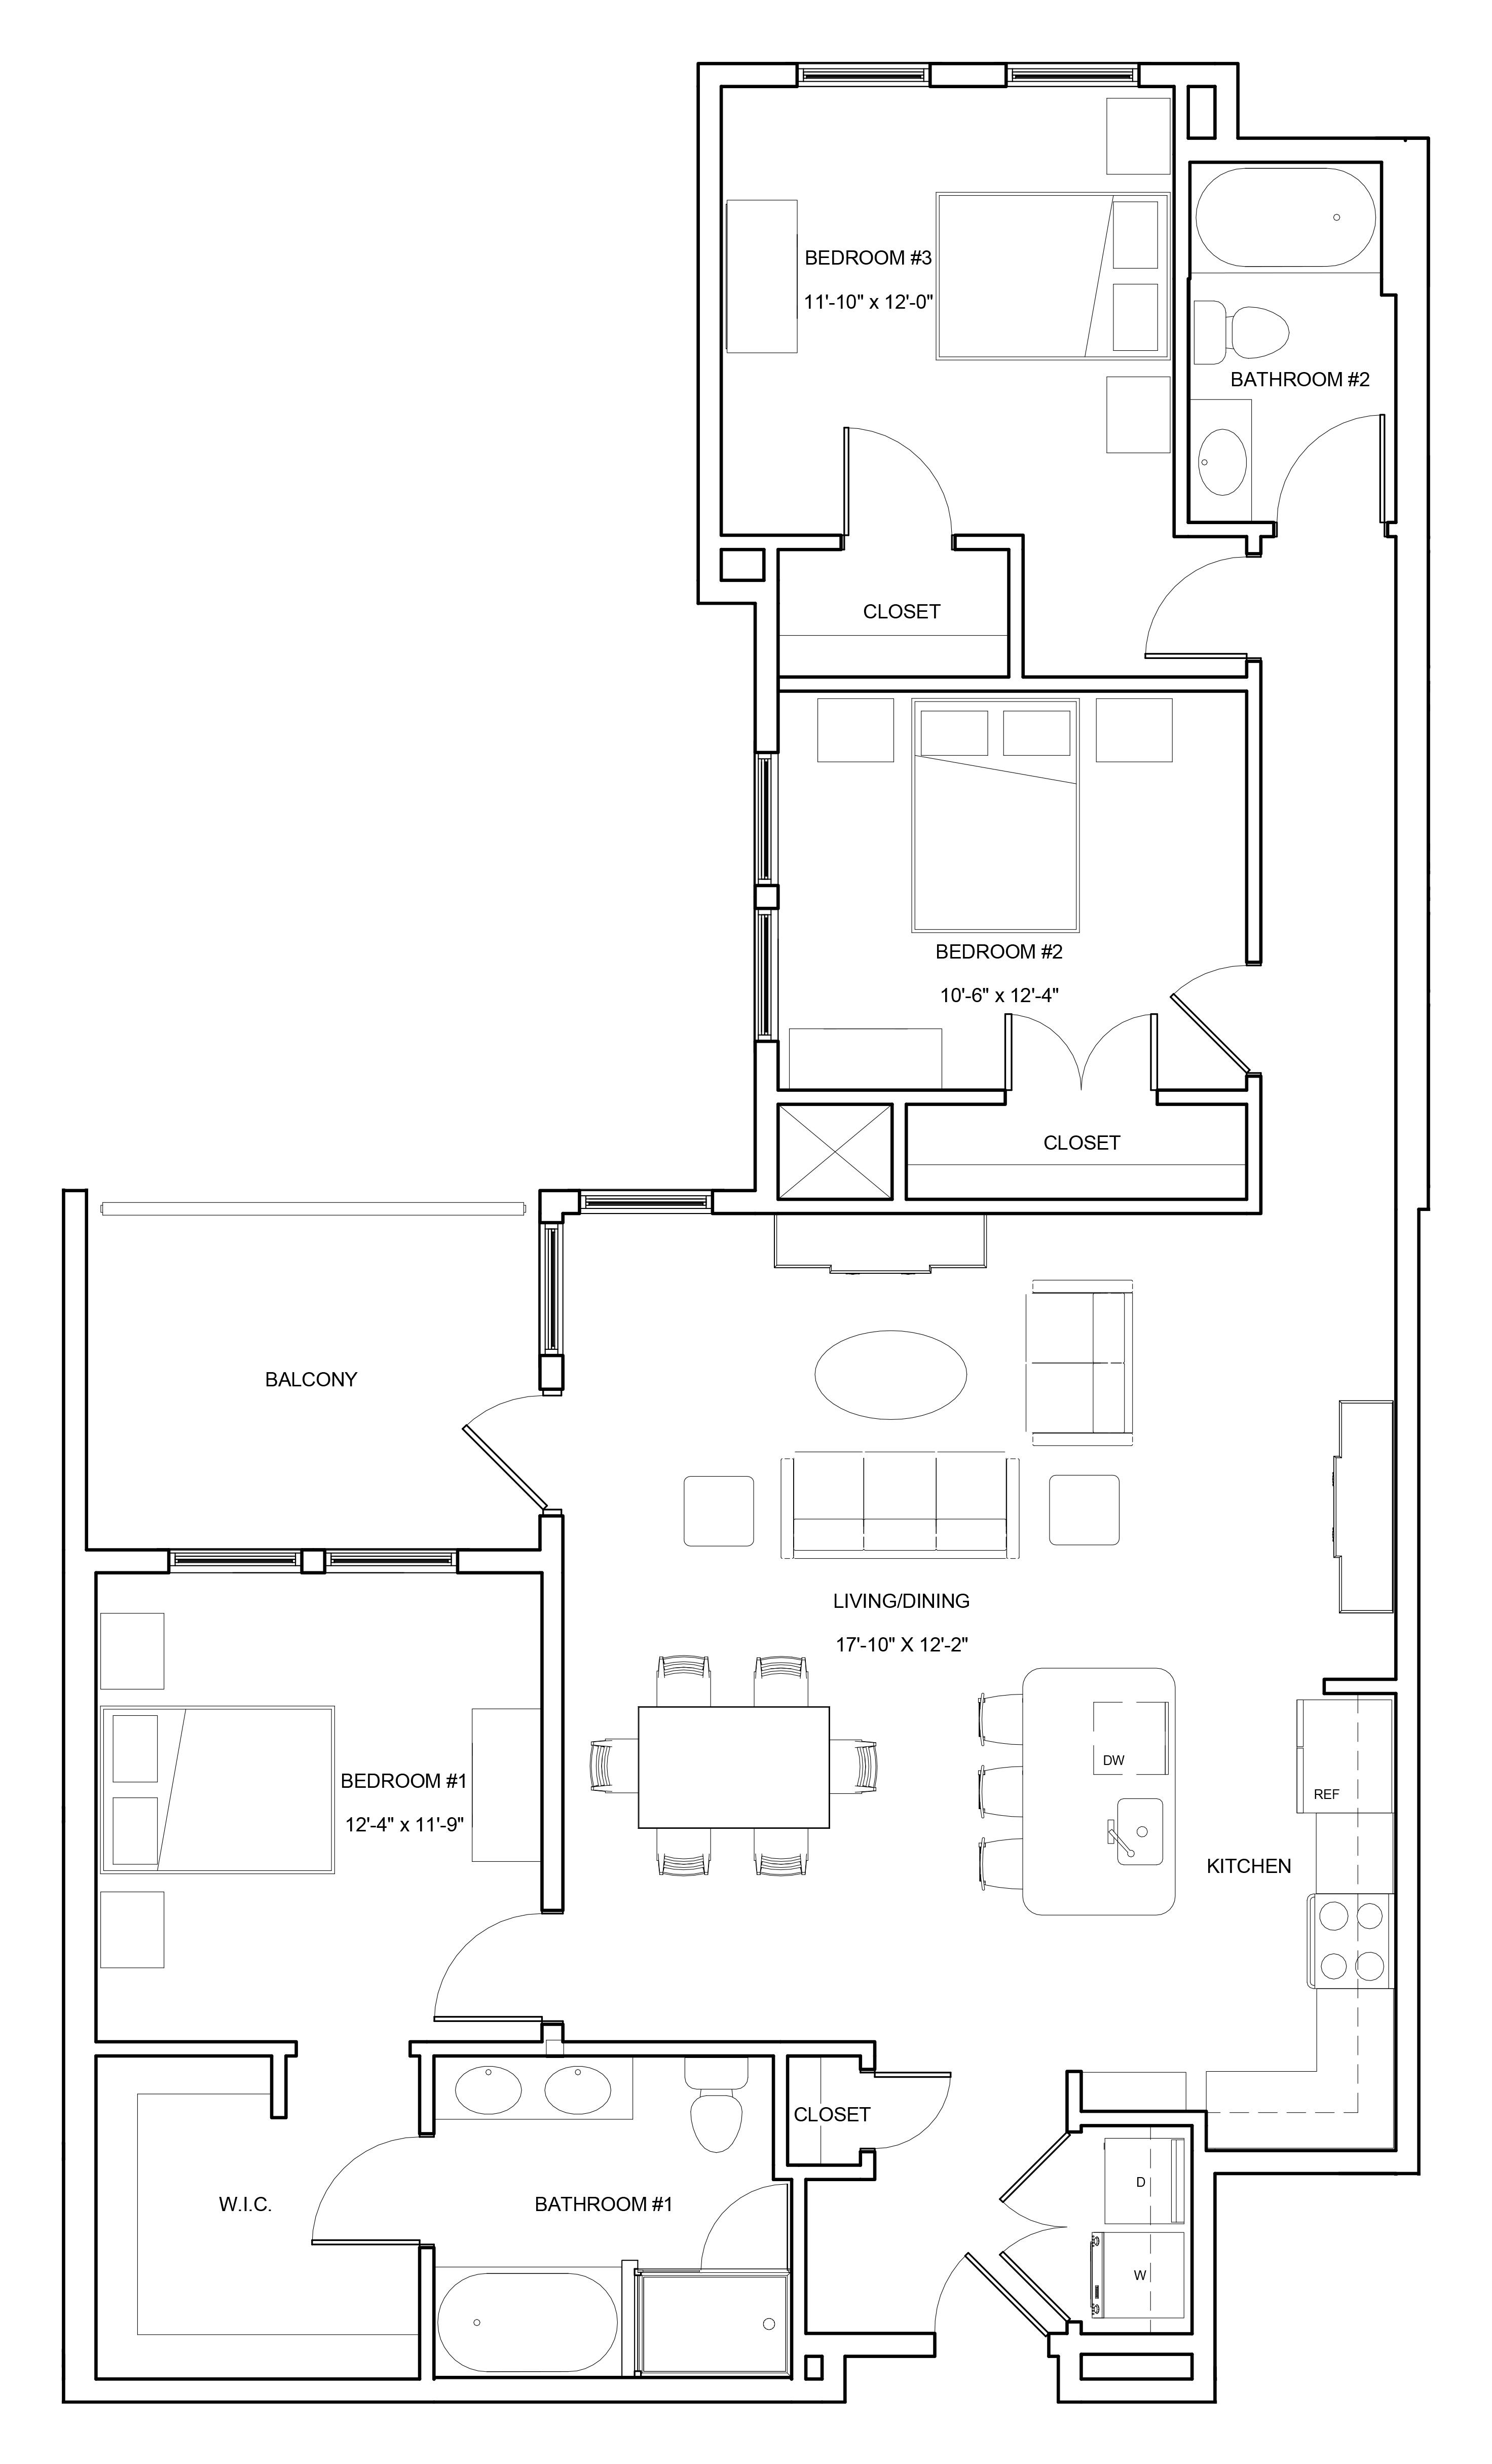 P0663804 c1 2 floorplan